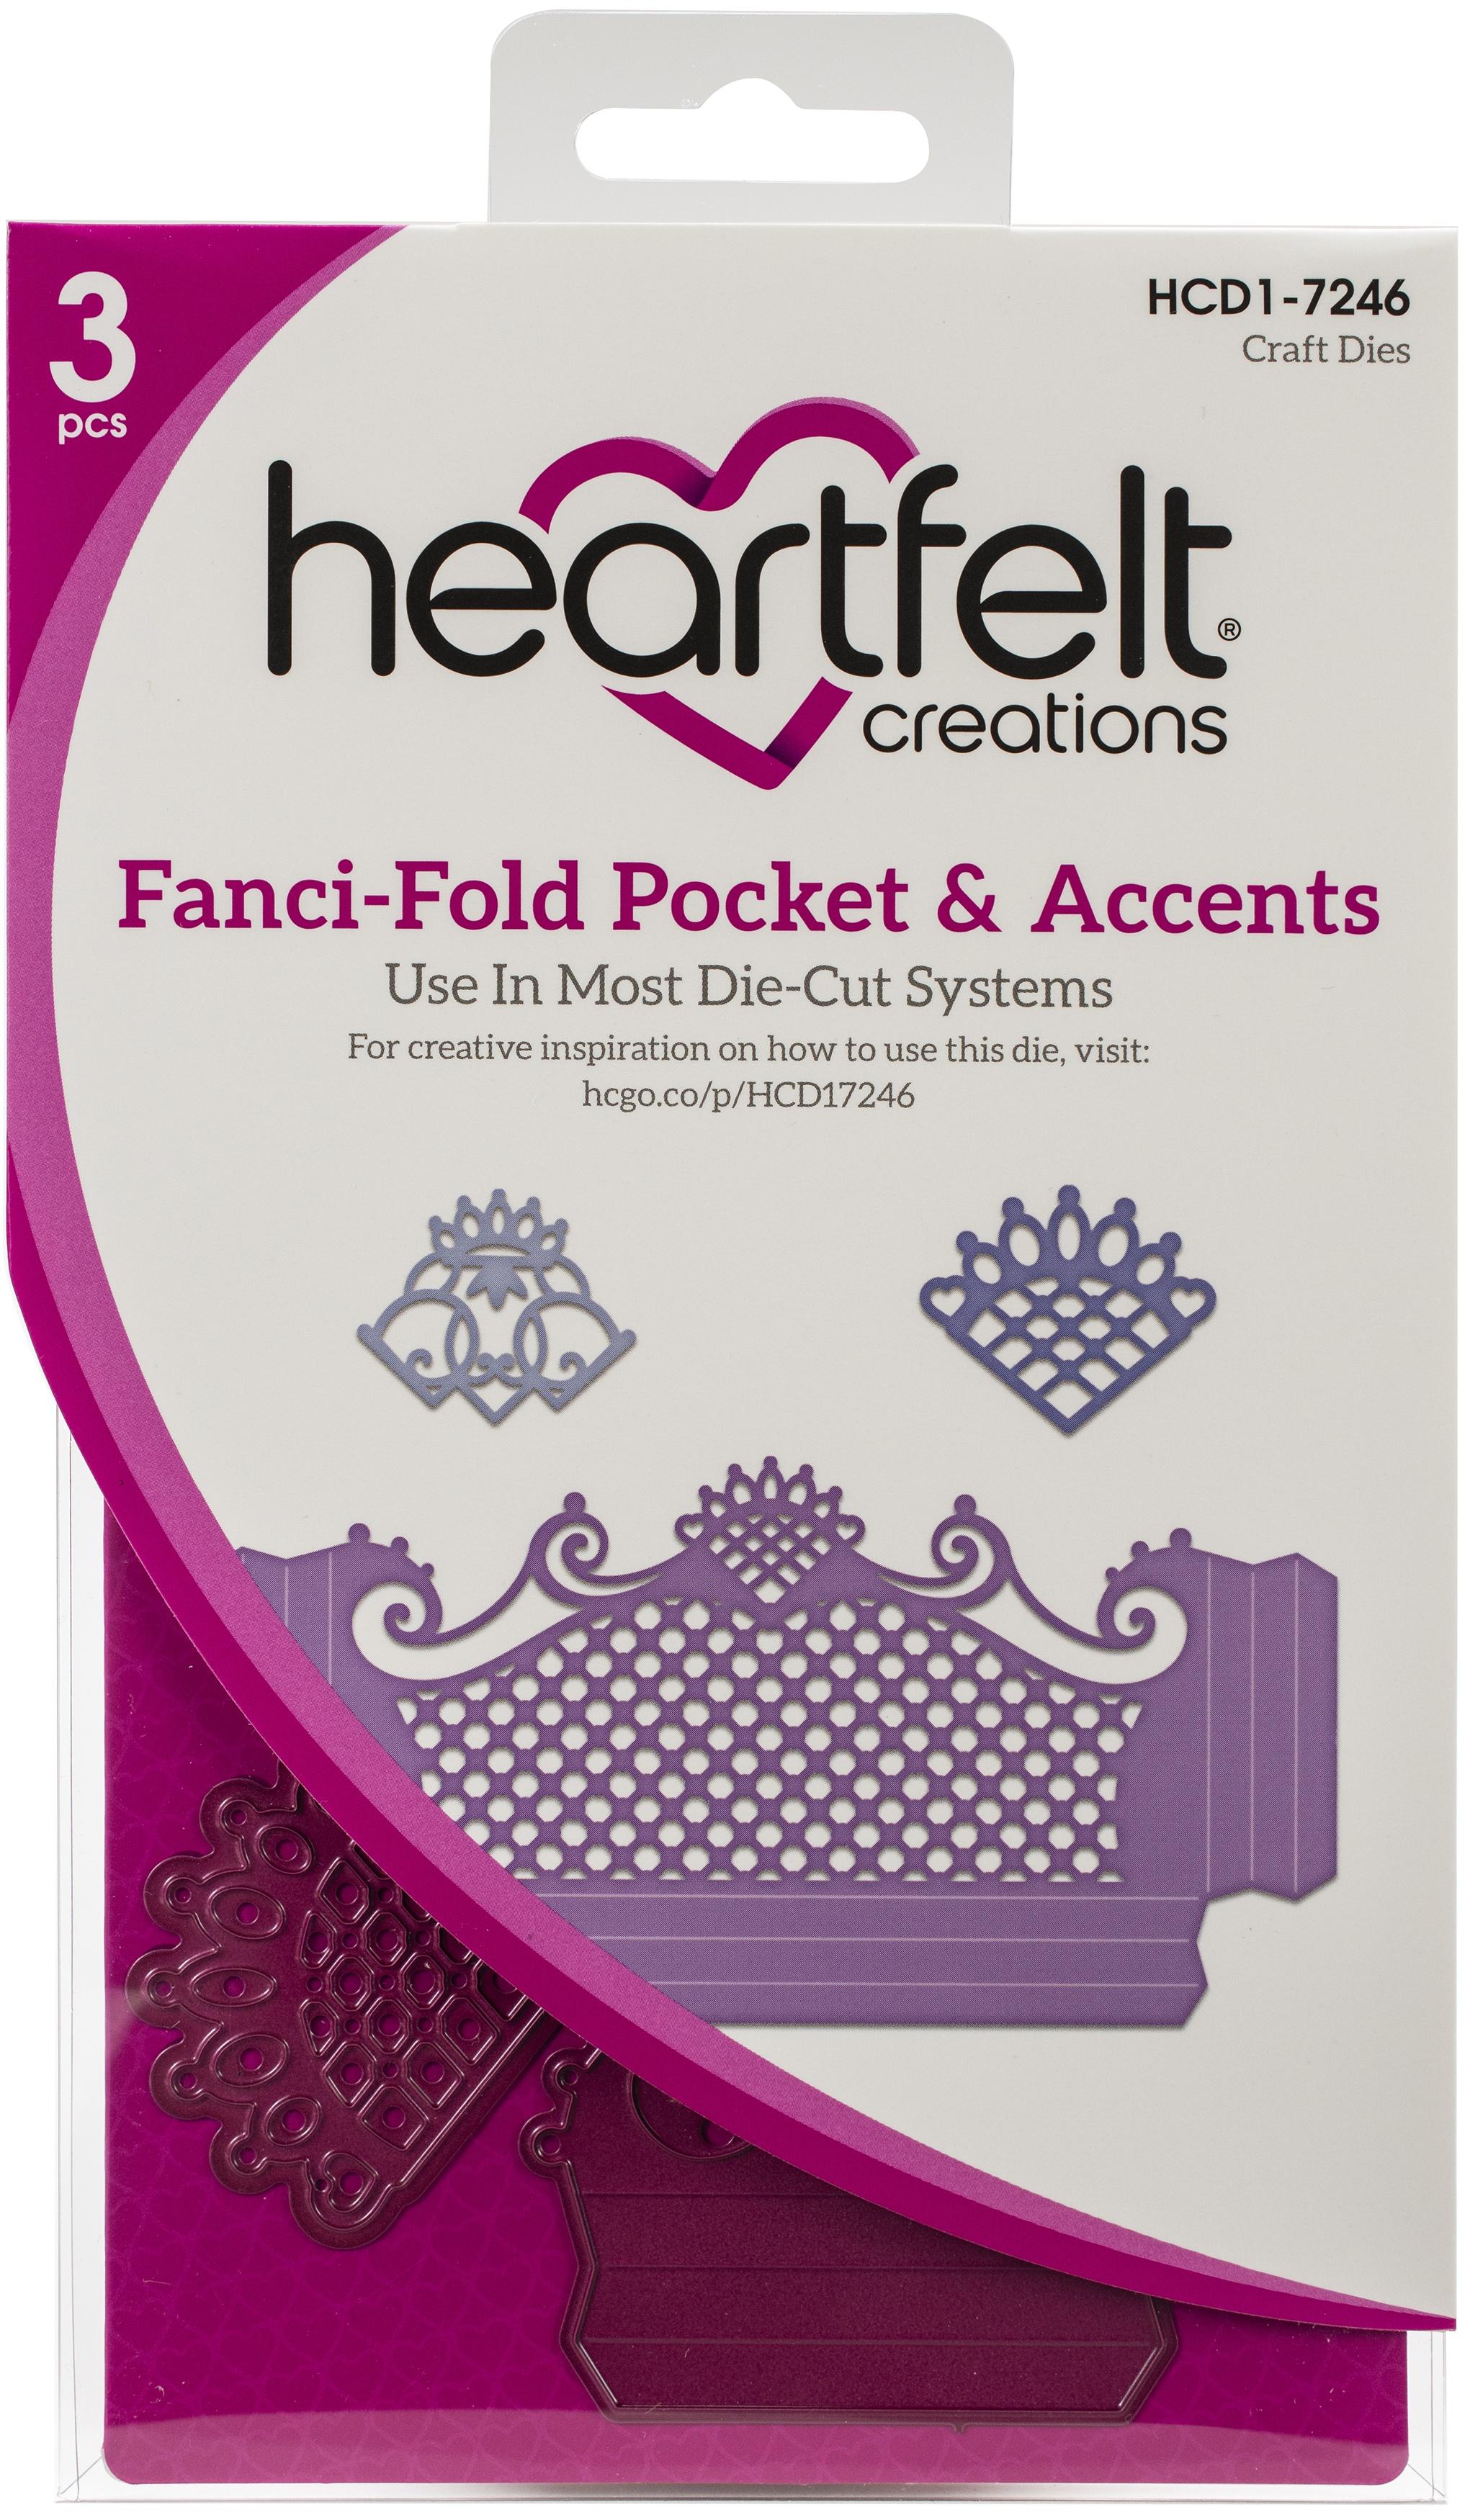 Heartfelt Creations Fanci-Fold Pocket & Accents Die